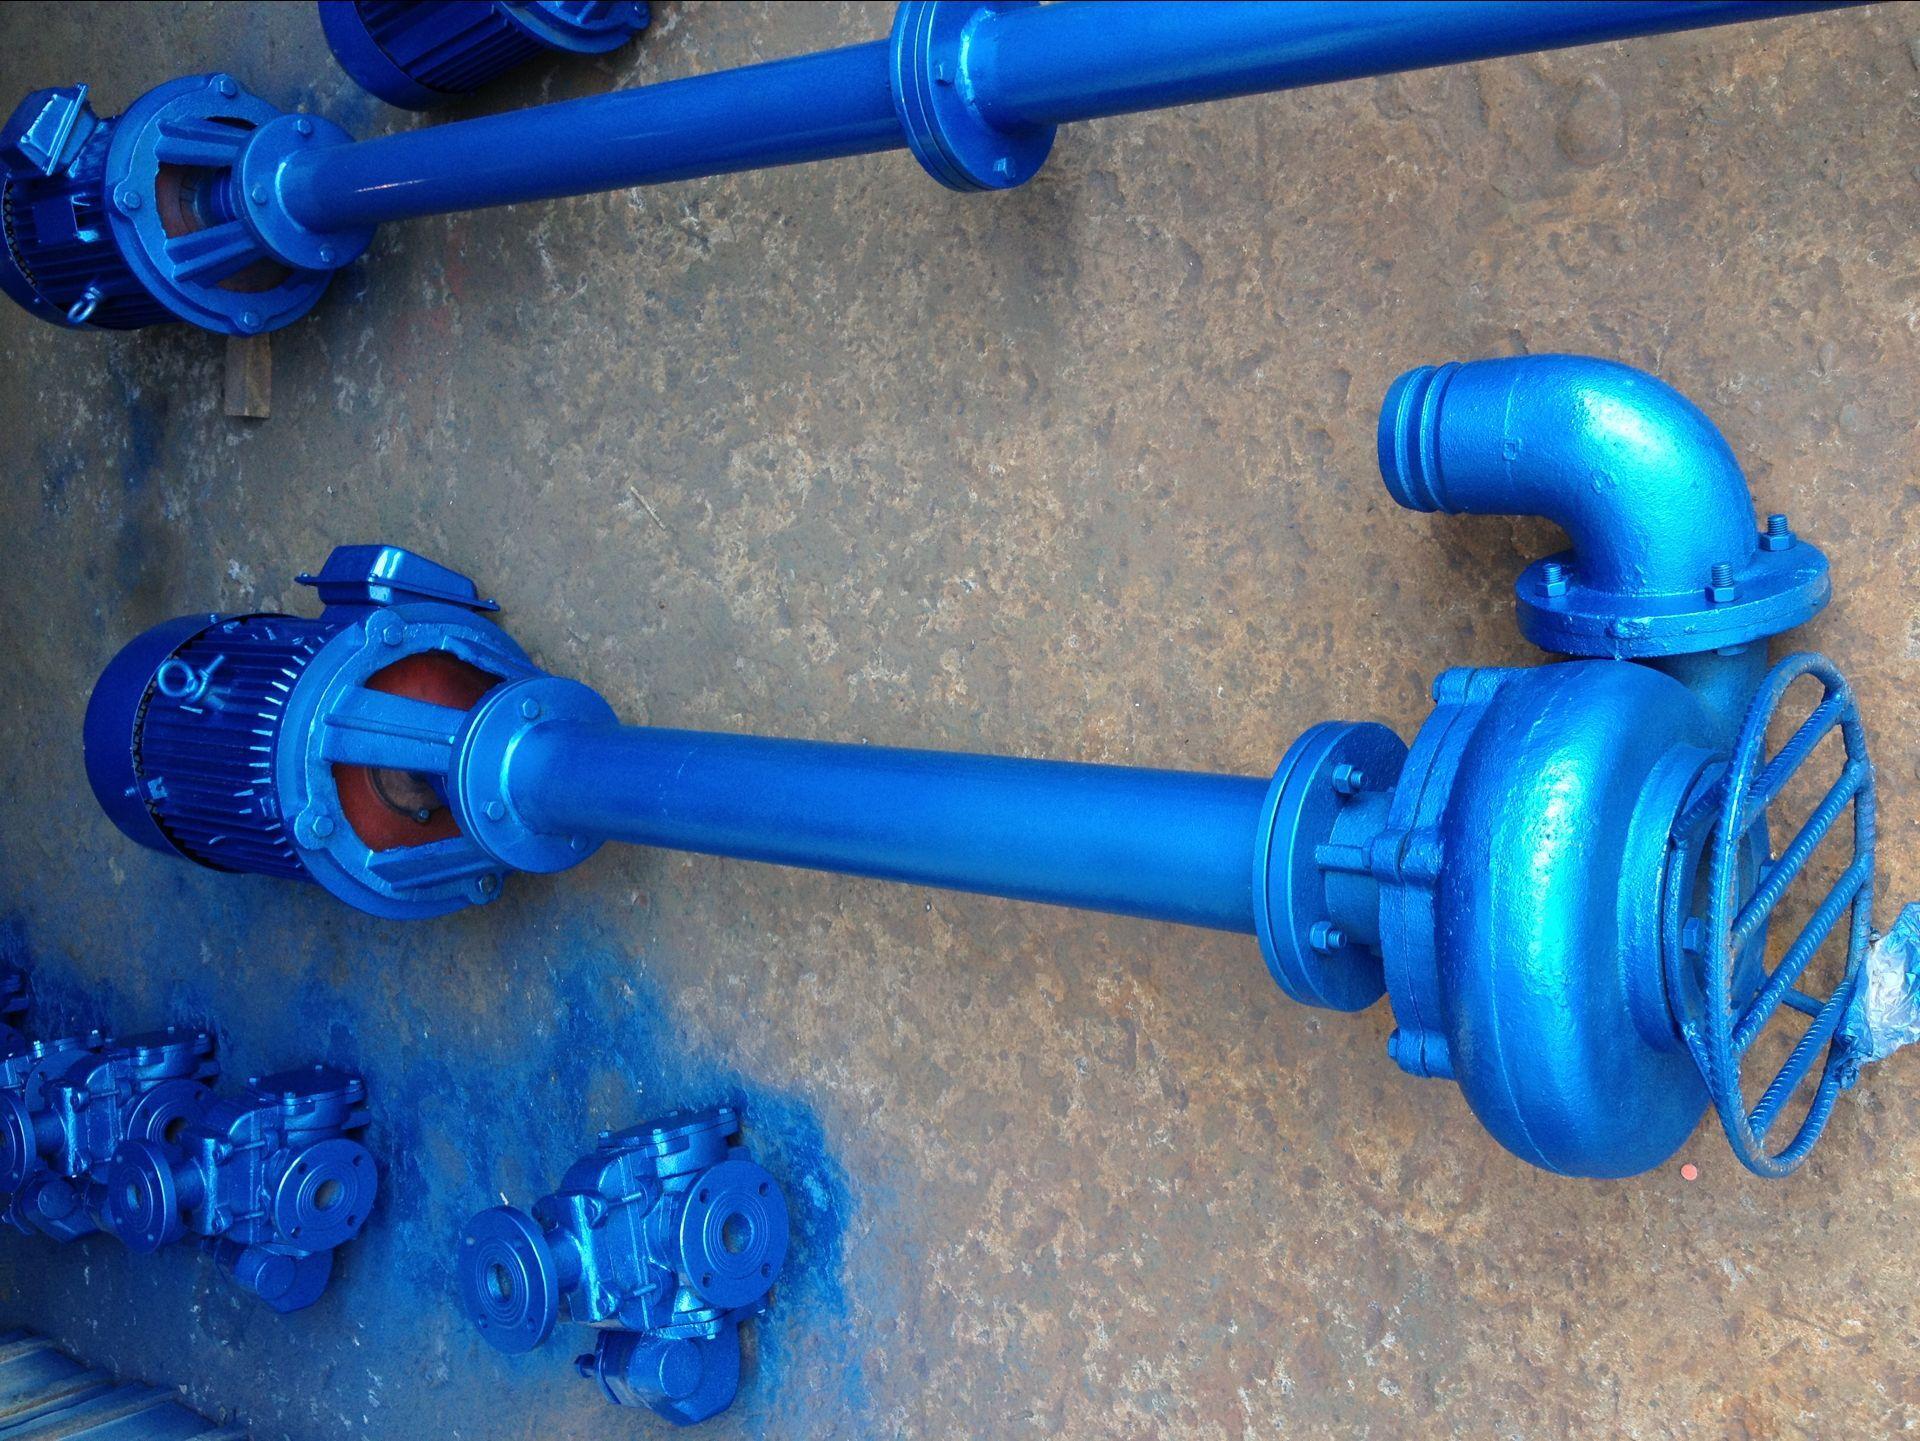 NL污水长轴泥浆泵